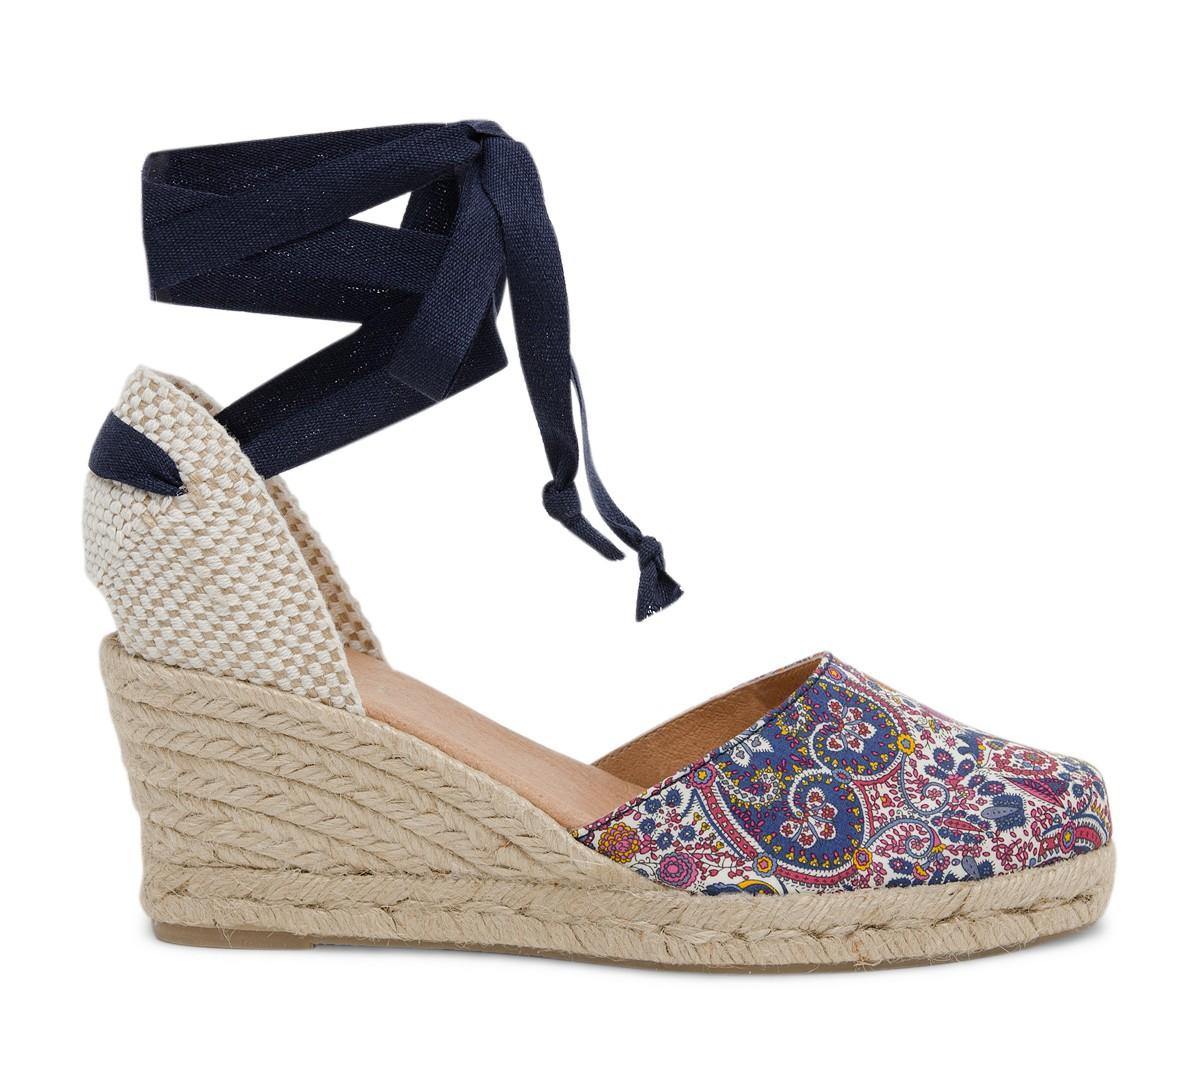 Chaussure espadrille compensee femme